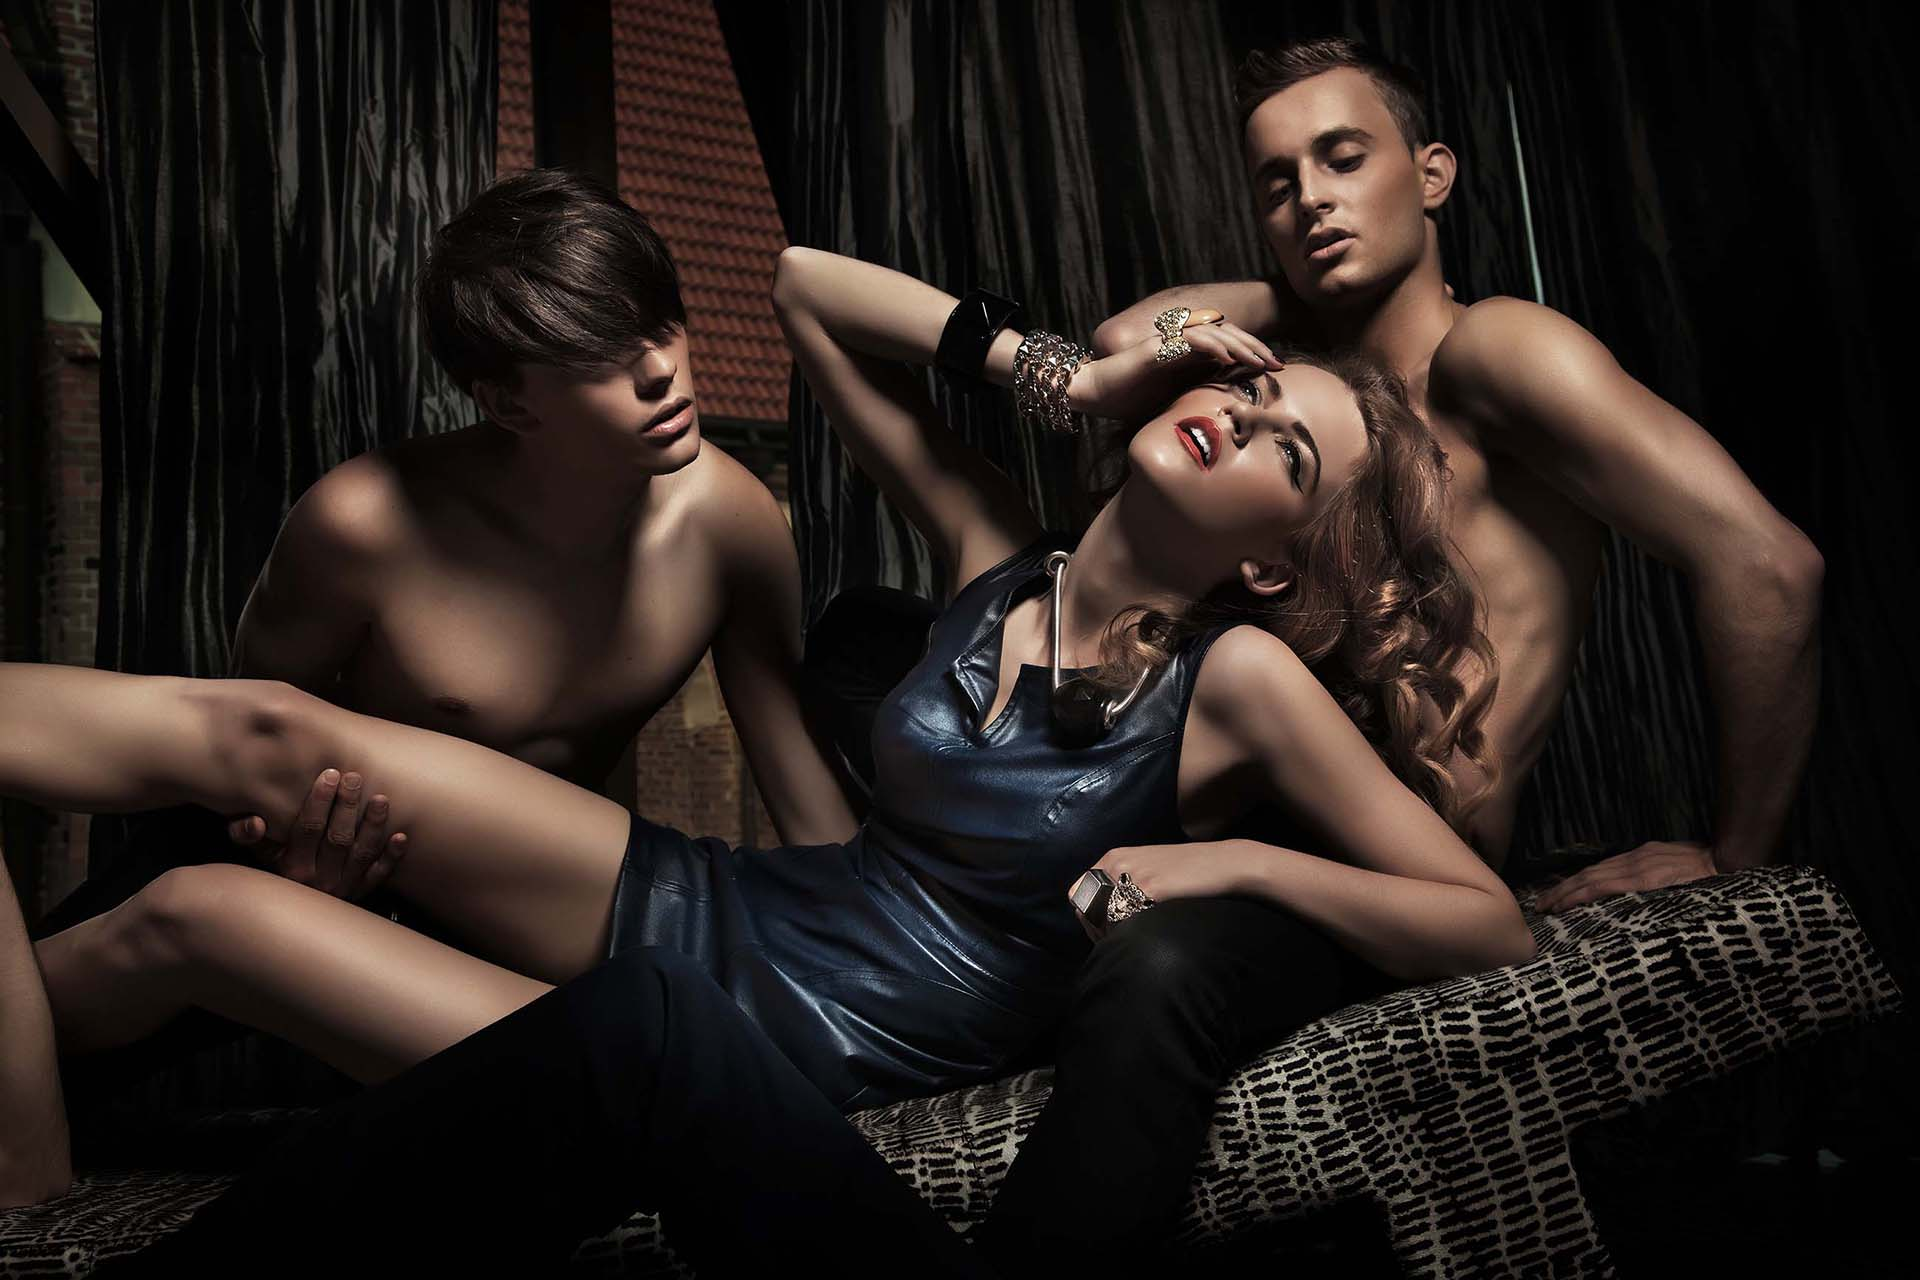 Preach reccomend Erotic swinger parties